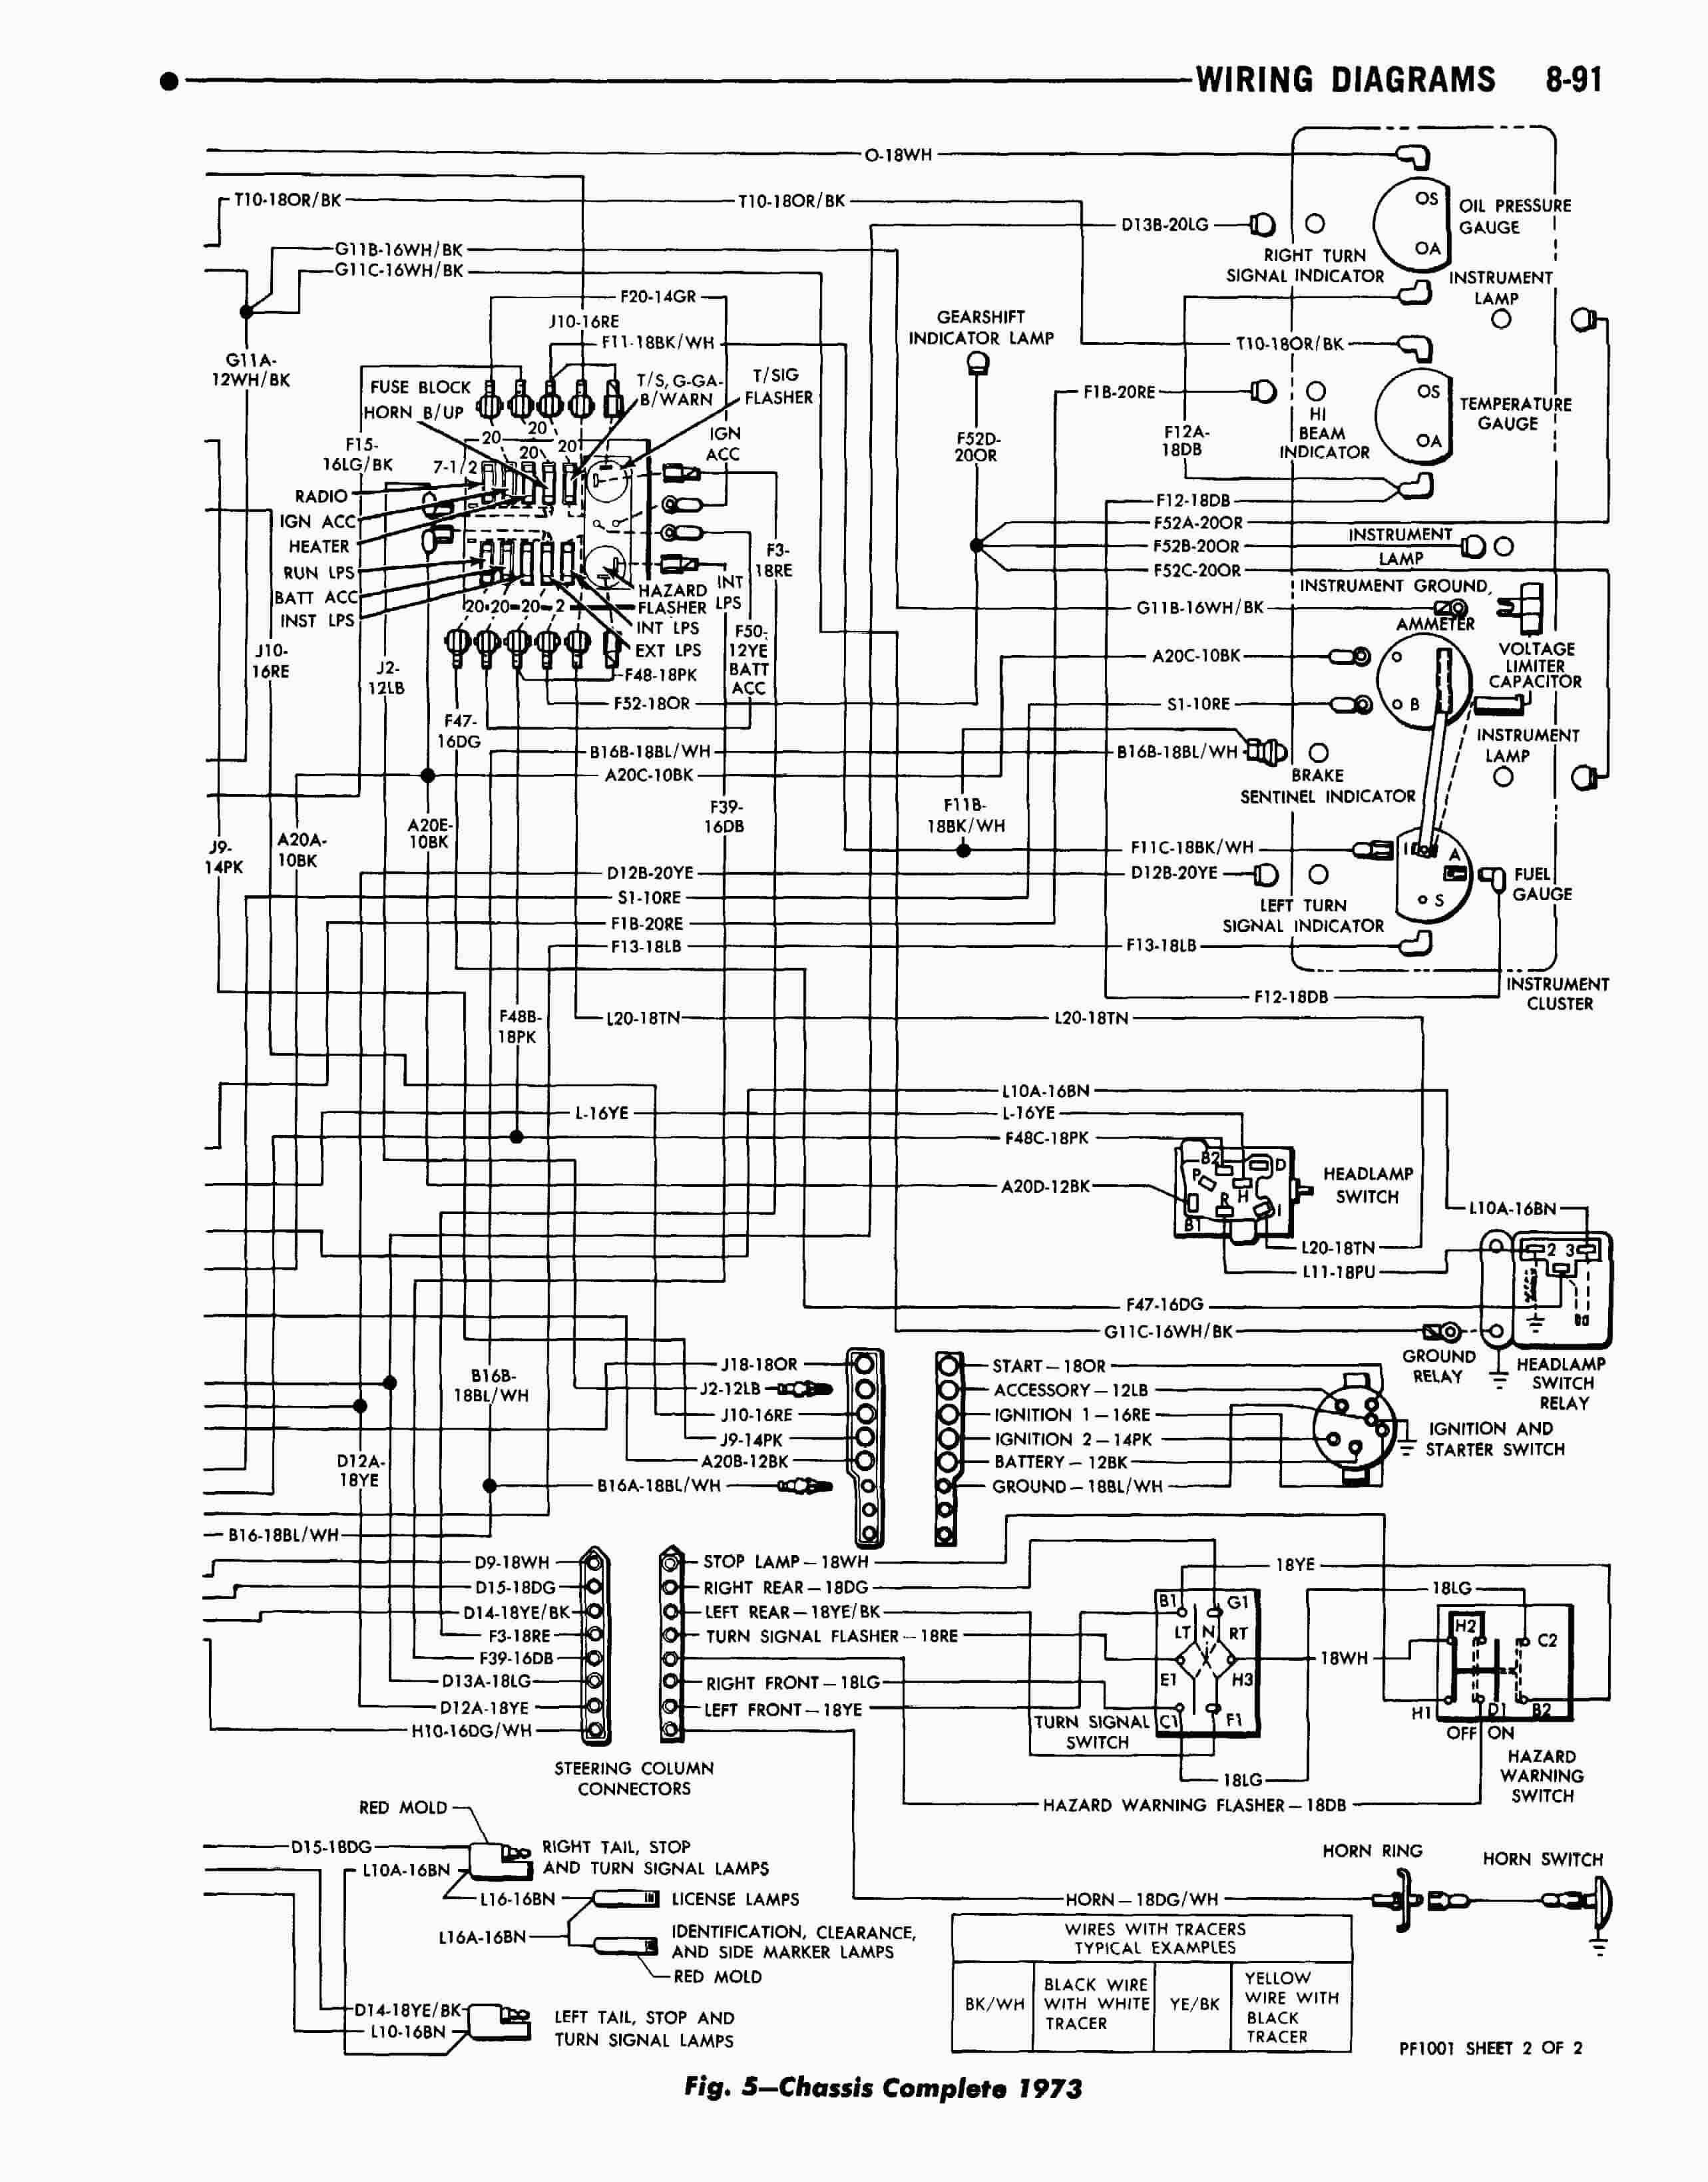 Holiday Rambler Rv Wiring Diagram Speaker Crossover Wiring Diagram Begeboy Wiring Diagram Source